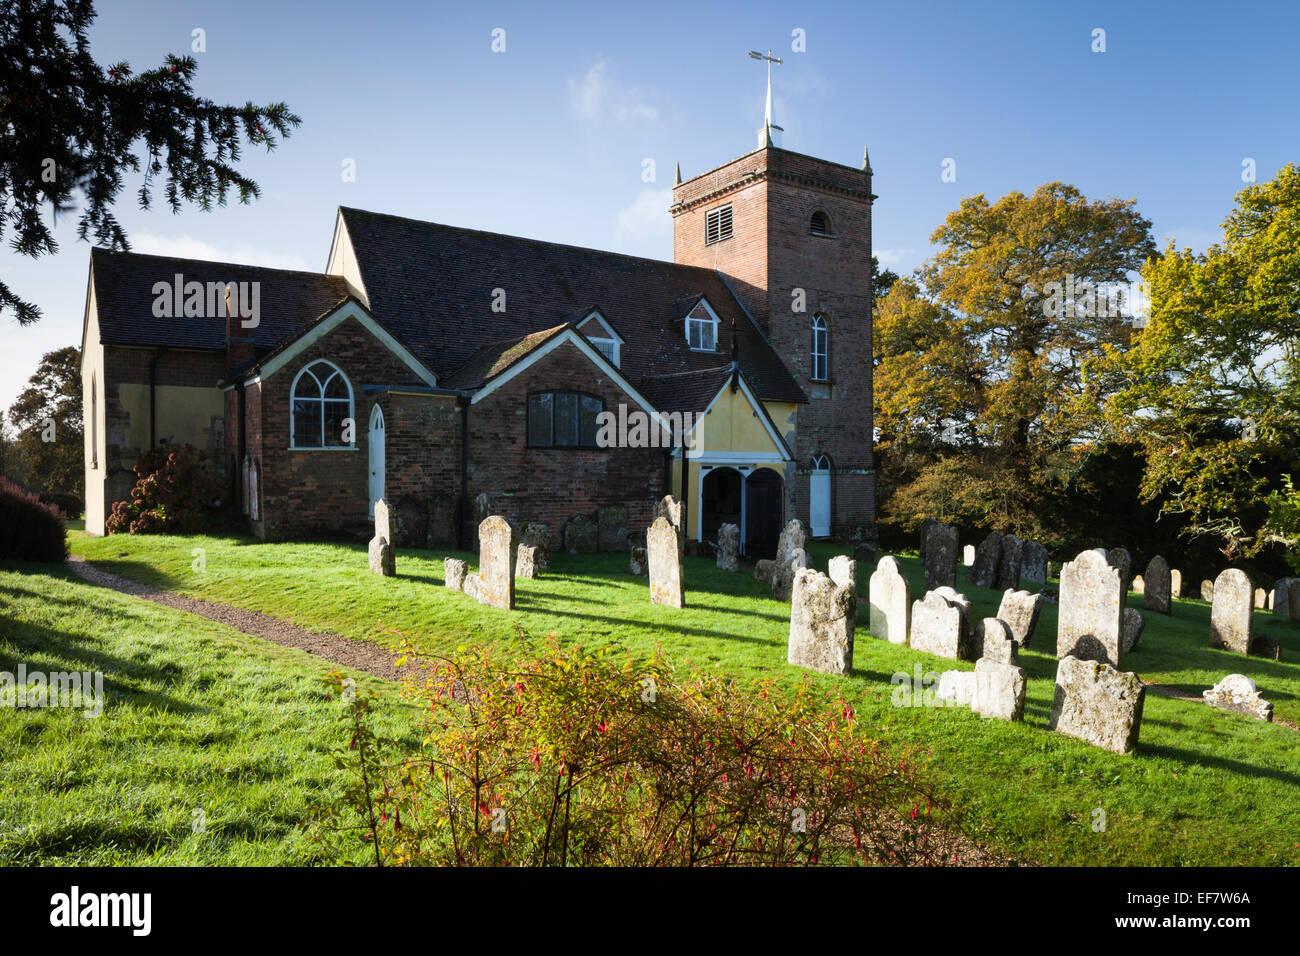 All Saints church and churchyard is where the grave of author, Sir Arthur Conan Doyle can be found, Minstead, Hampshire, - Stock Image